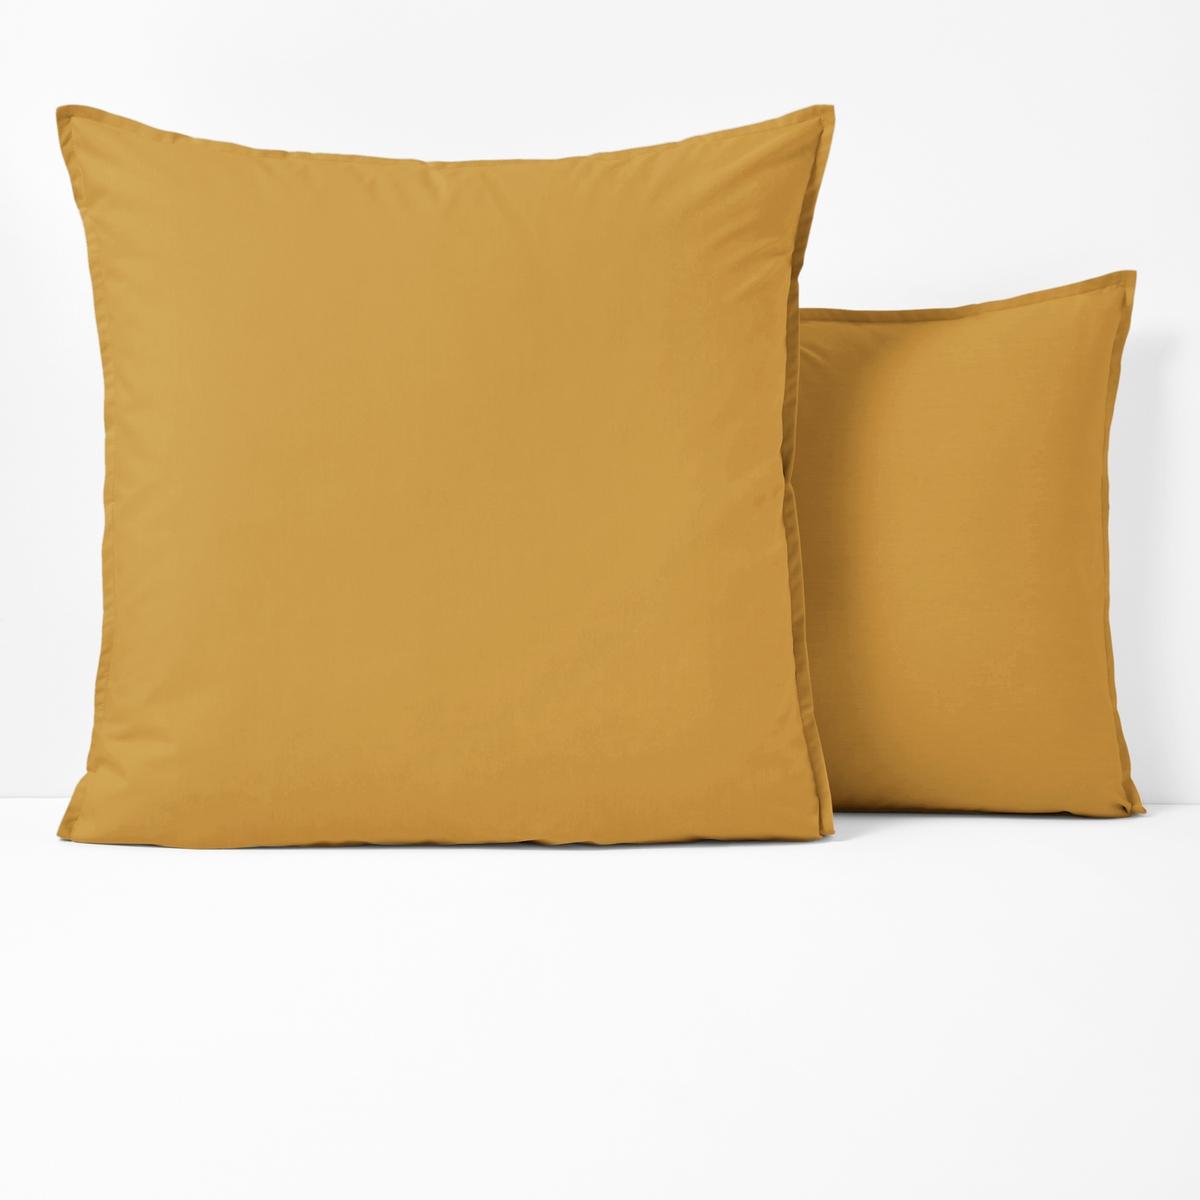 Наволочка LaRedoute Однотонная из перкали из биохлопка 63 x 63 см желтый наволочка laredoute из хлопковой перкали isoline 63 x 63 см другие